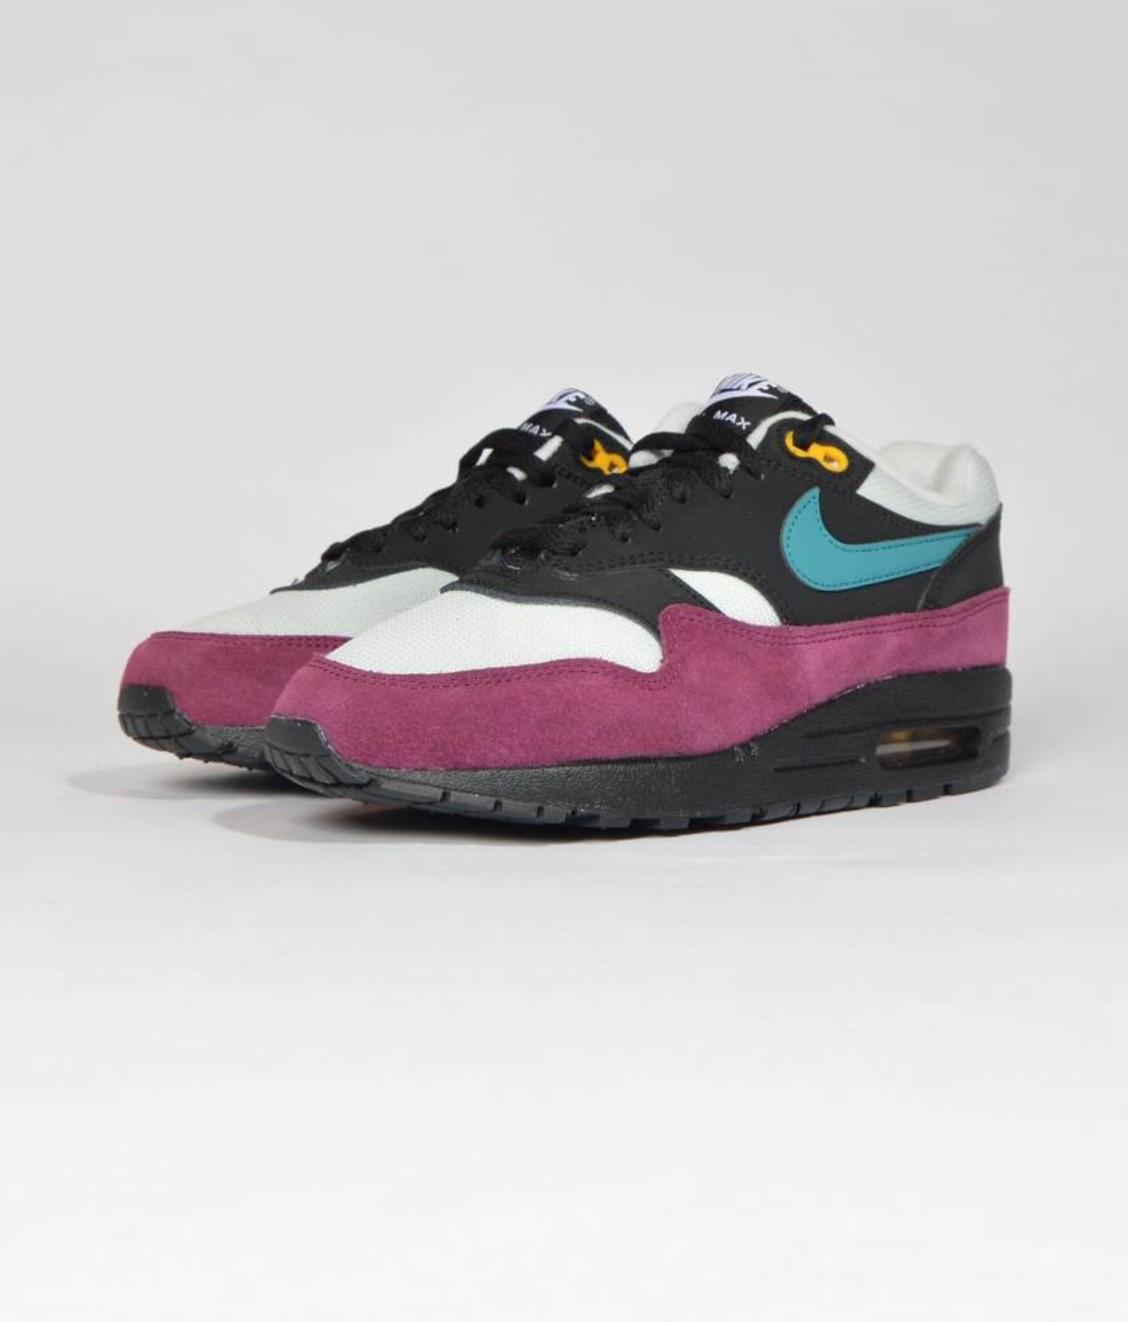 newest e6e0a 6ae56 Nike Nike W Air Max 1 Black Geode Teal